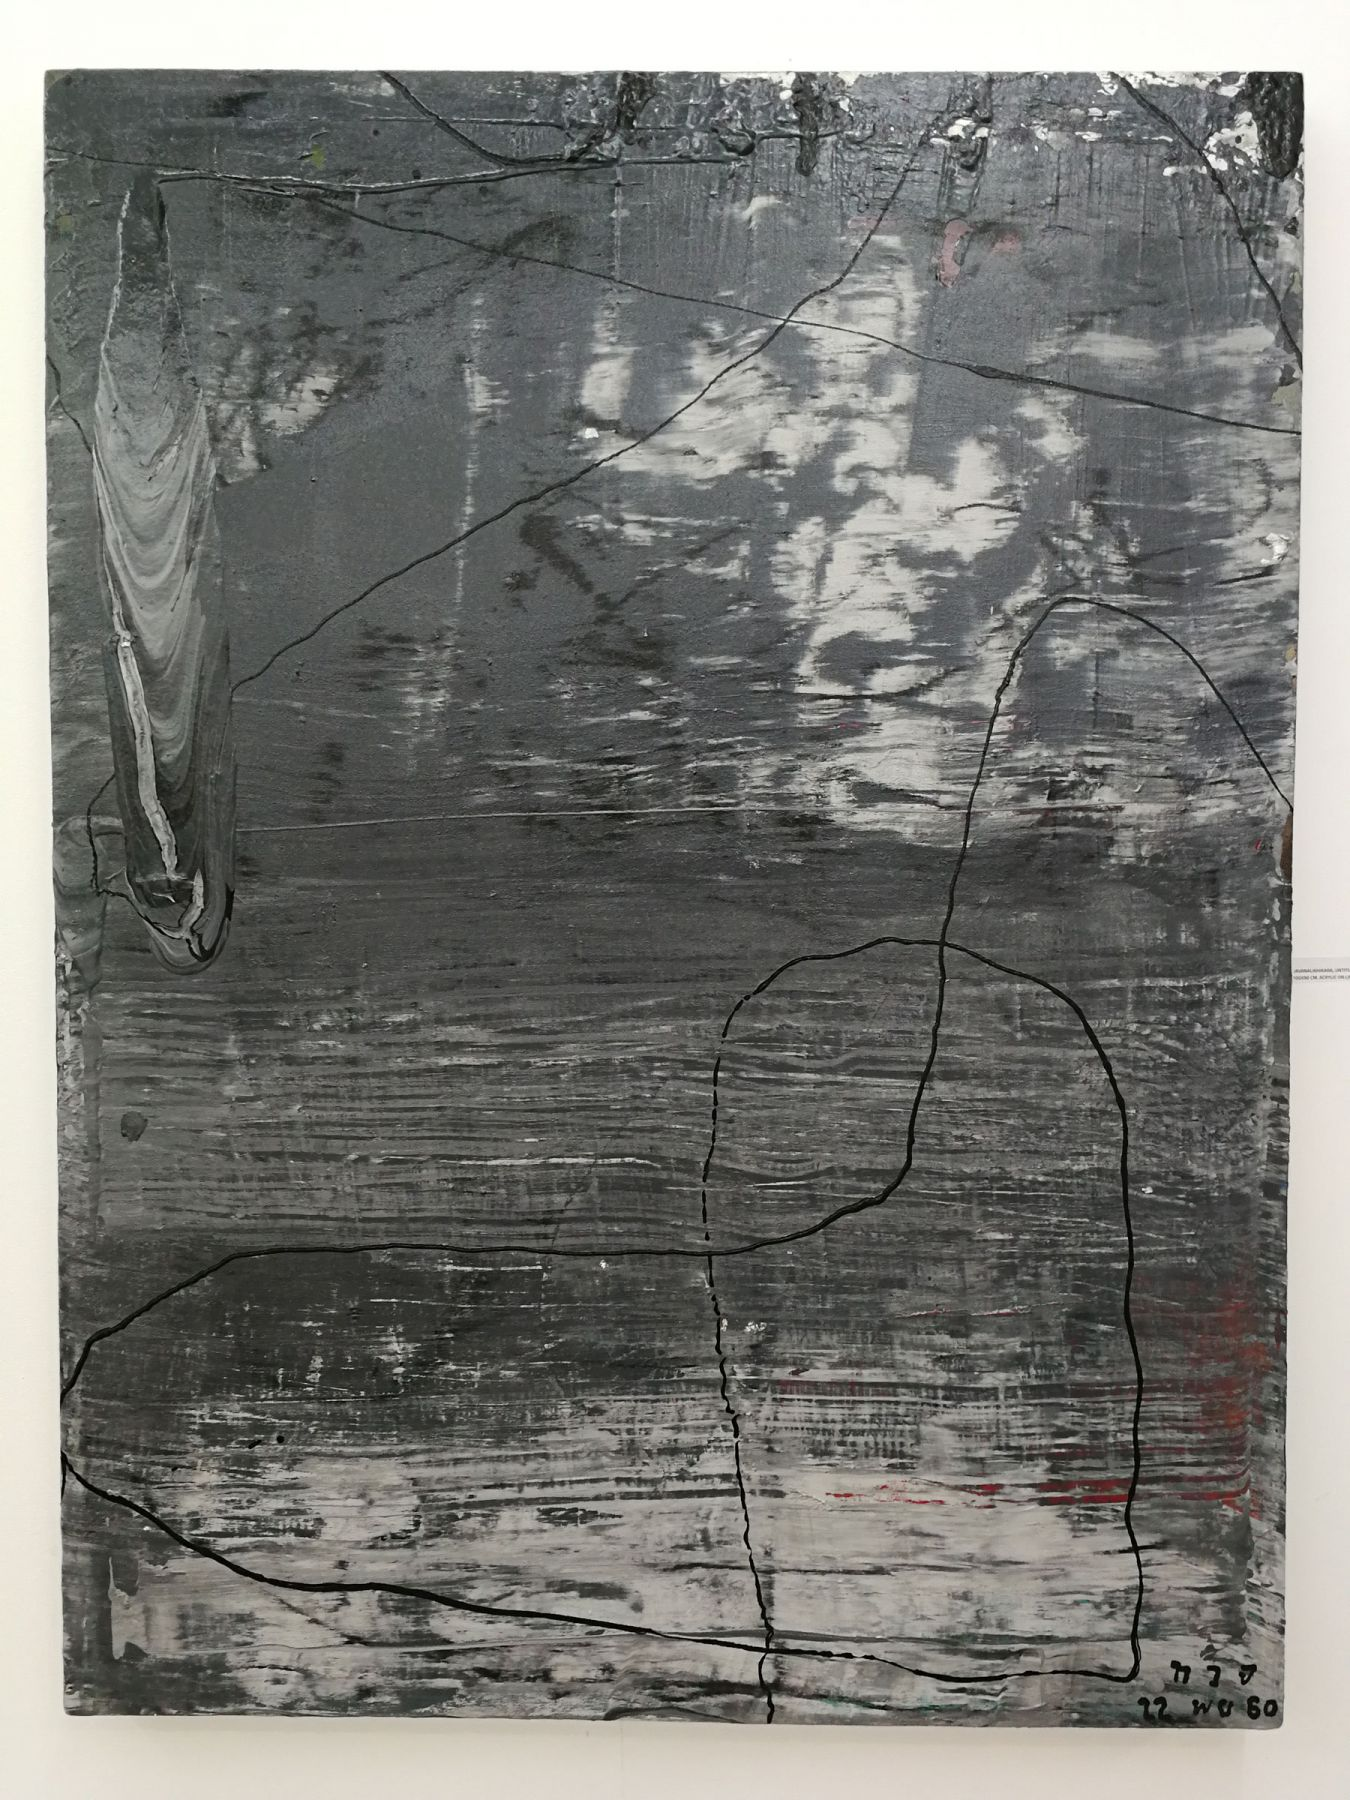 Thaiwijit Puengkasemsomboon Untitled (Monochrome 1), 2017 oil on canvas 47.2 x 35.4 in (120 x 90 cm)